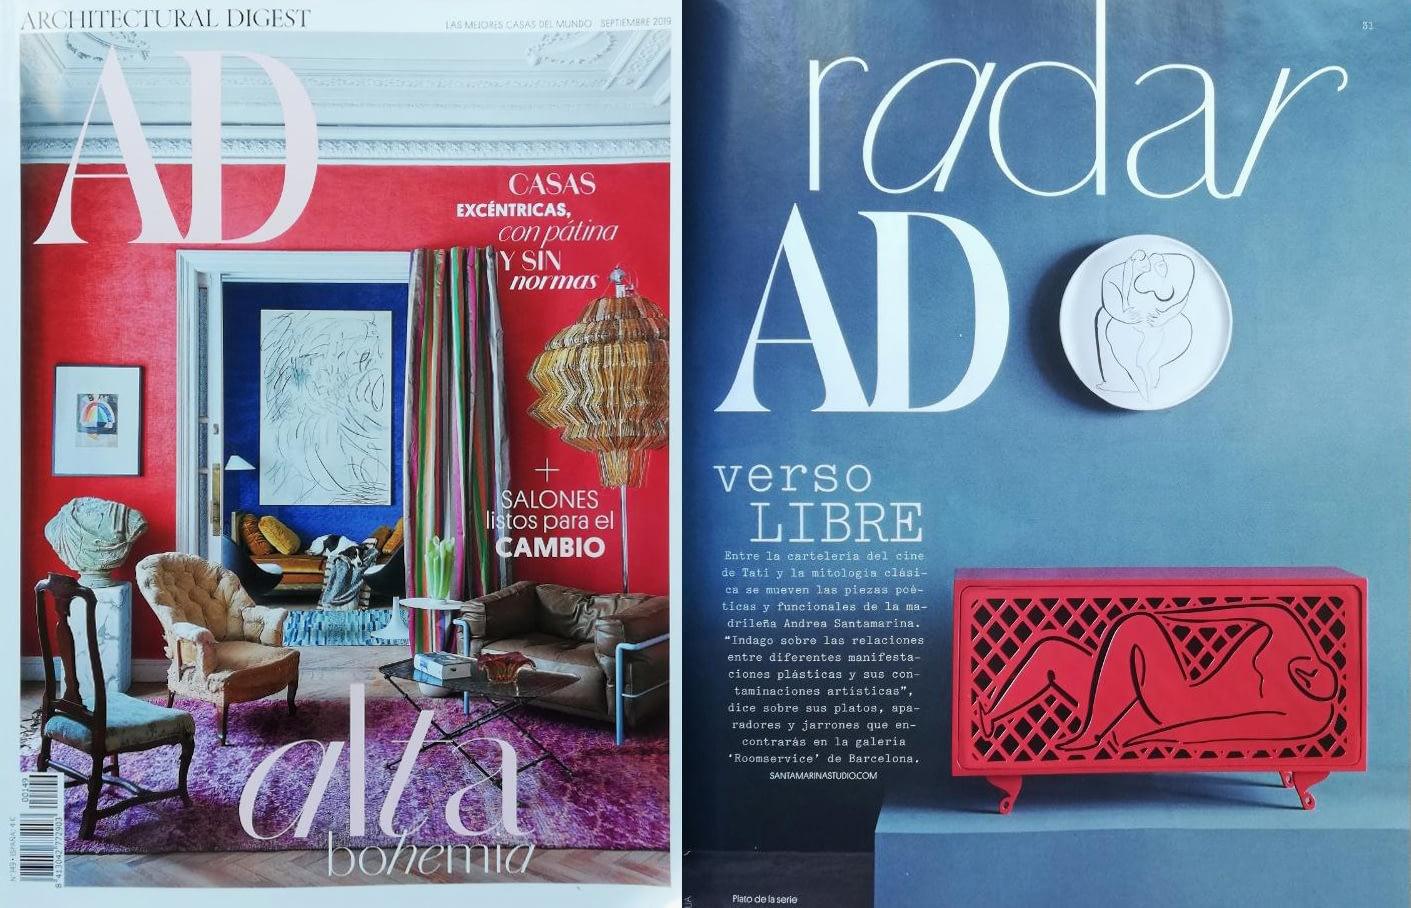 Andrea Santamarina Press AD Spain Room Service Design Gallery Barcelona Design Week Design Art corregido